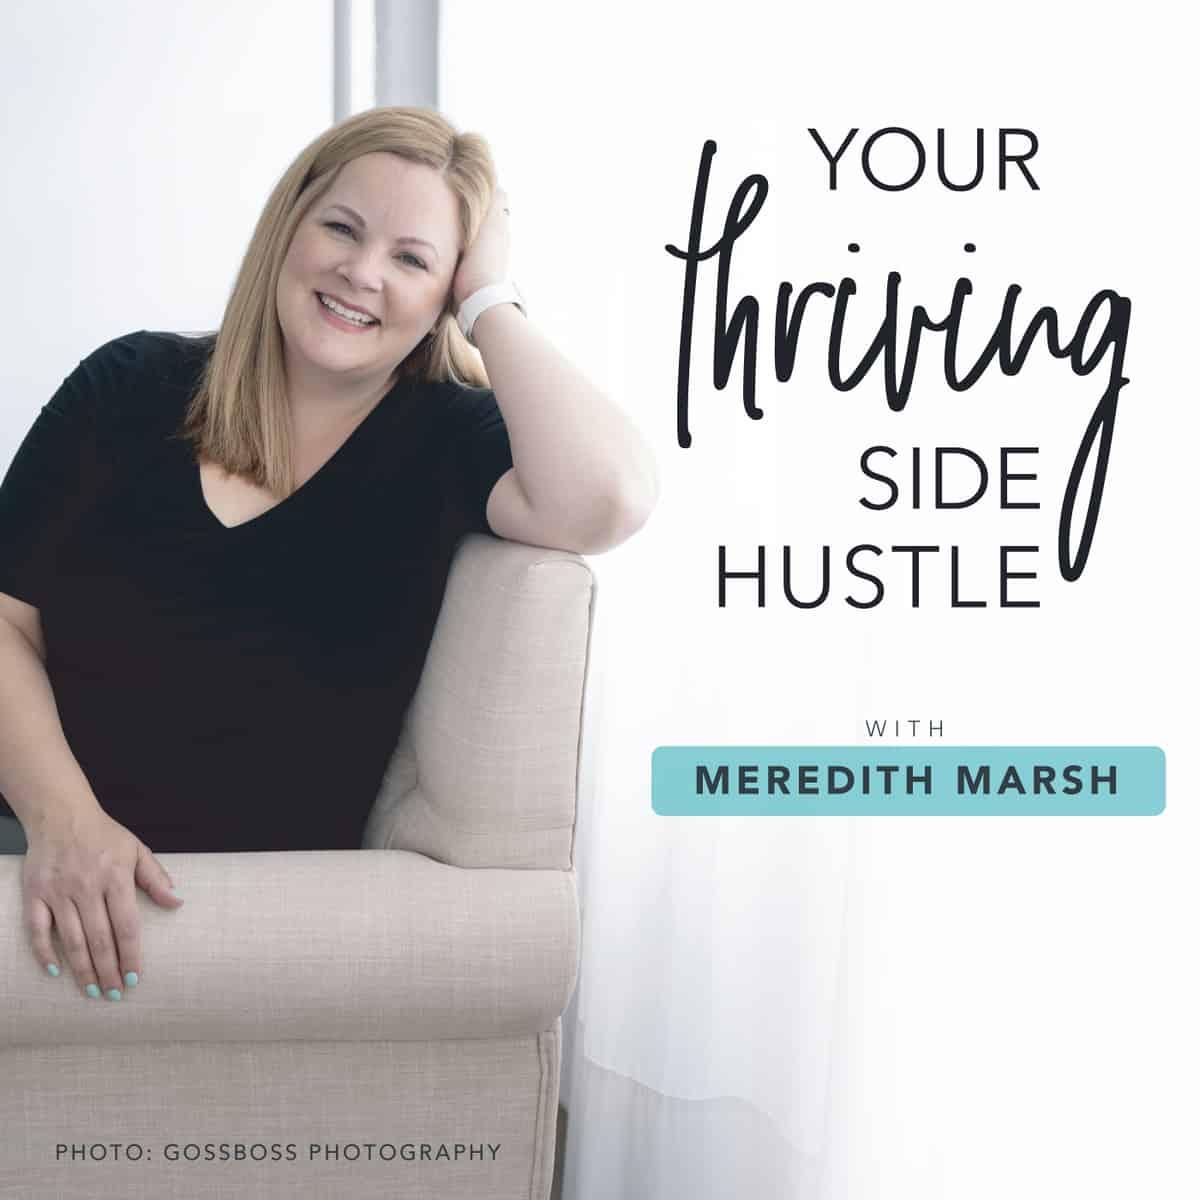 Your Thriving Side Hustle Branding 7 6 2020